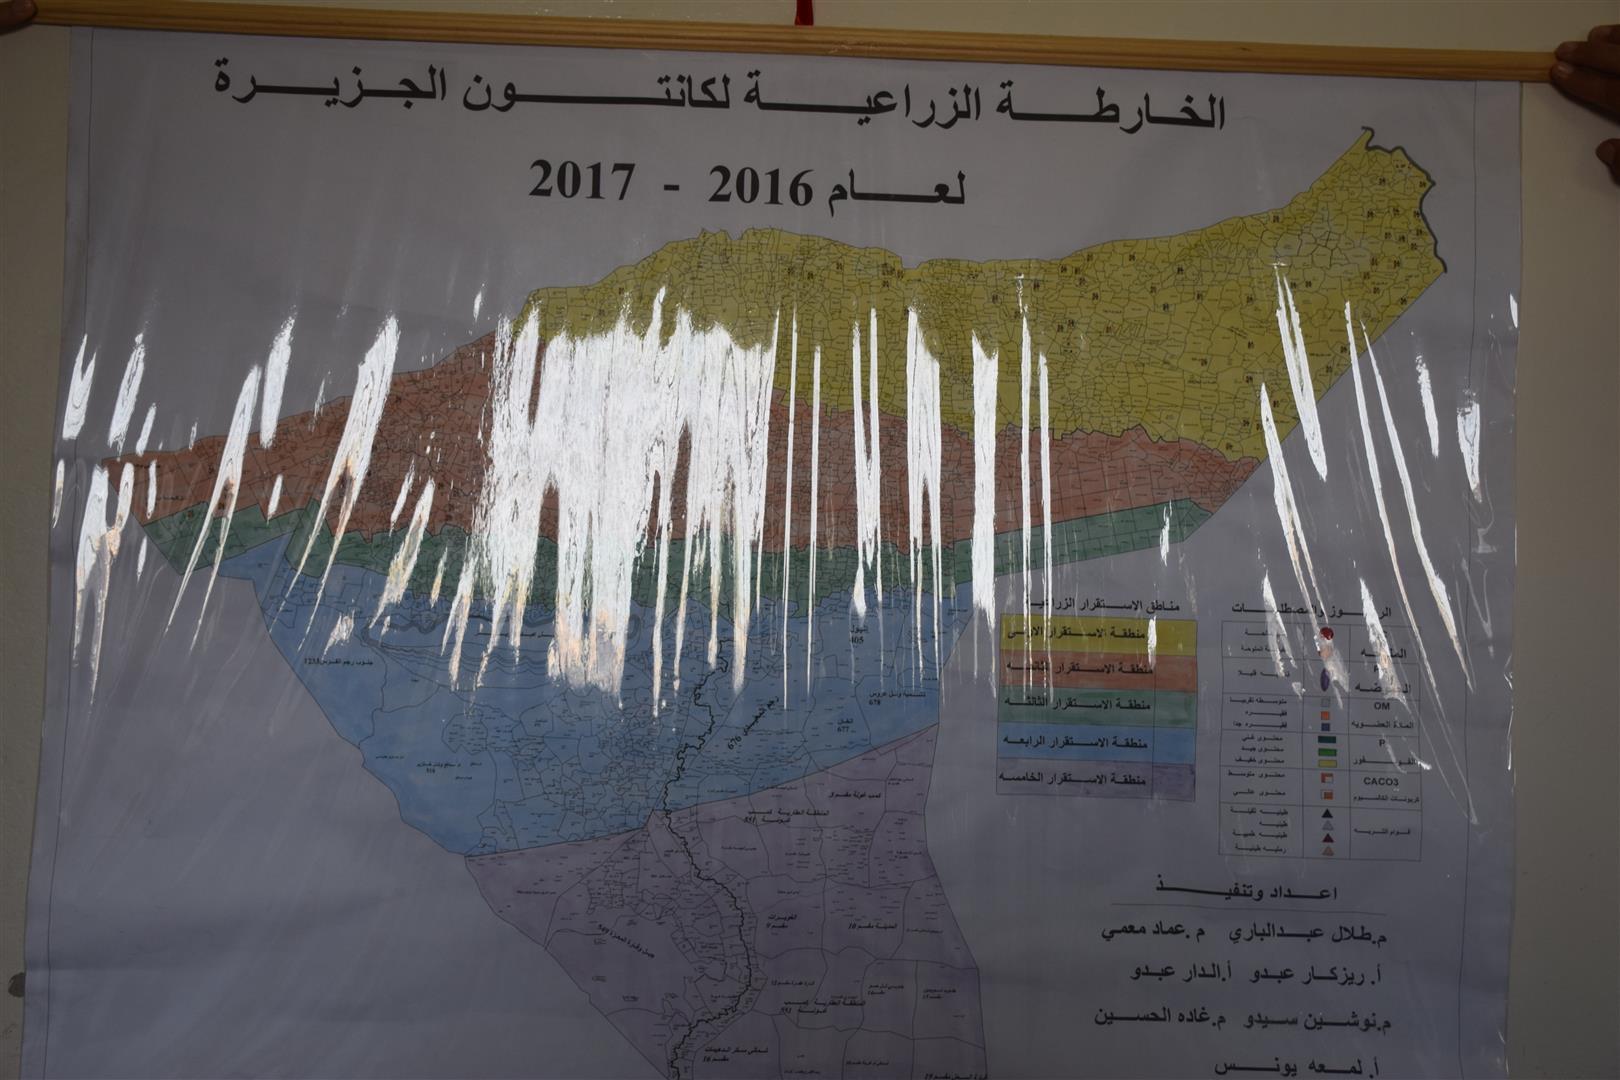 Scientific Research Center in al- Hasakah towards agricultural development